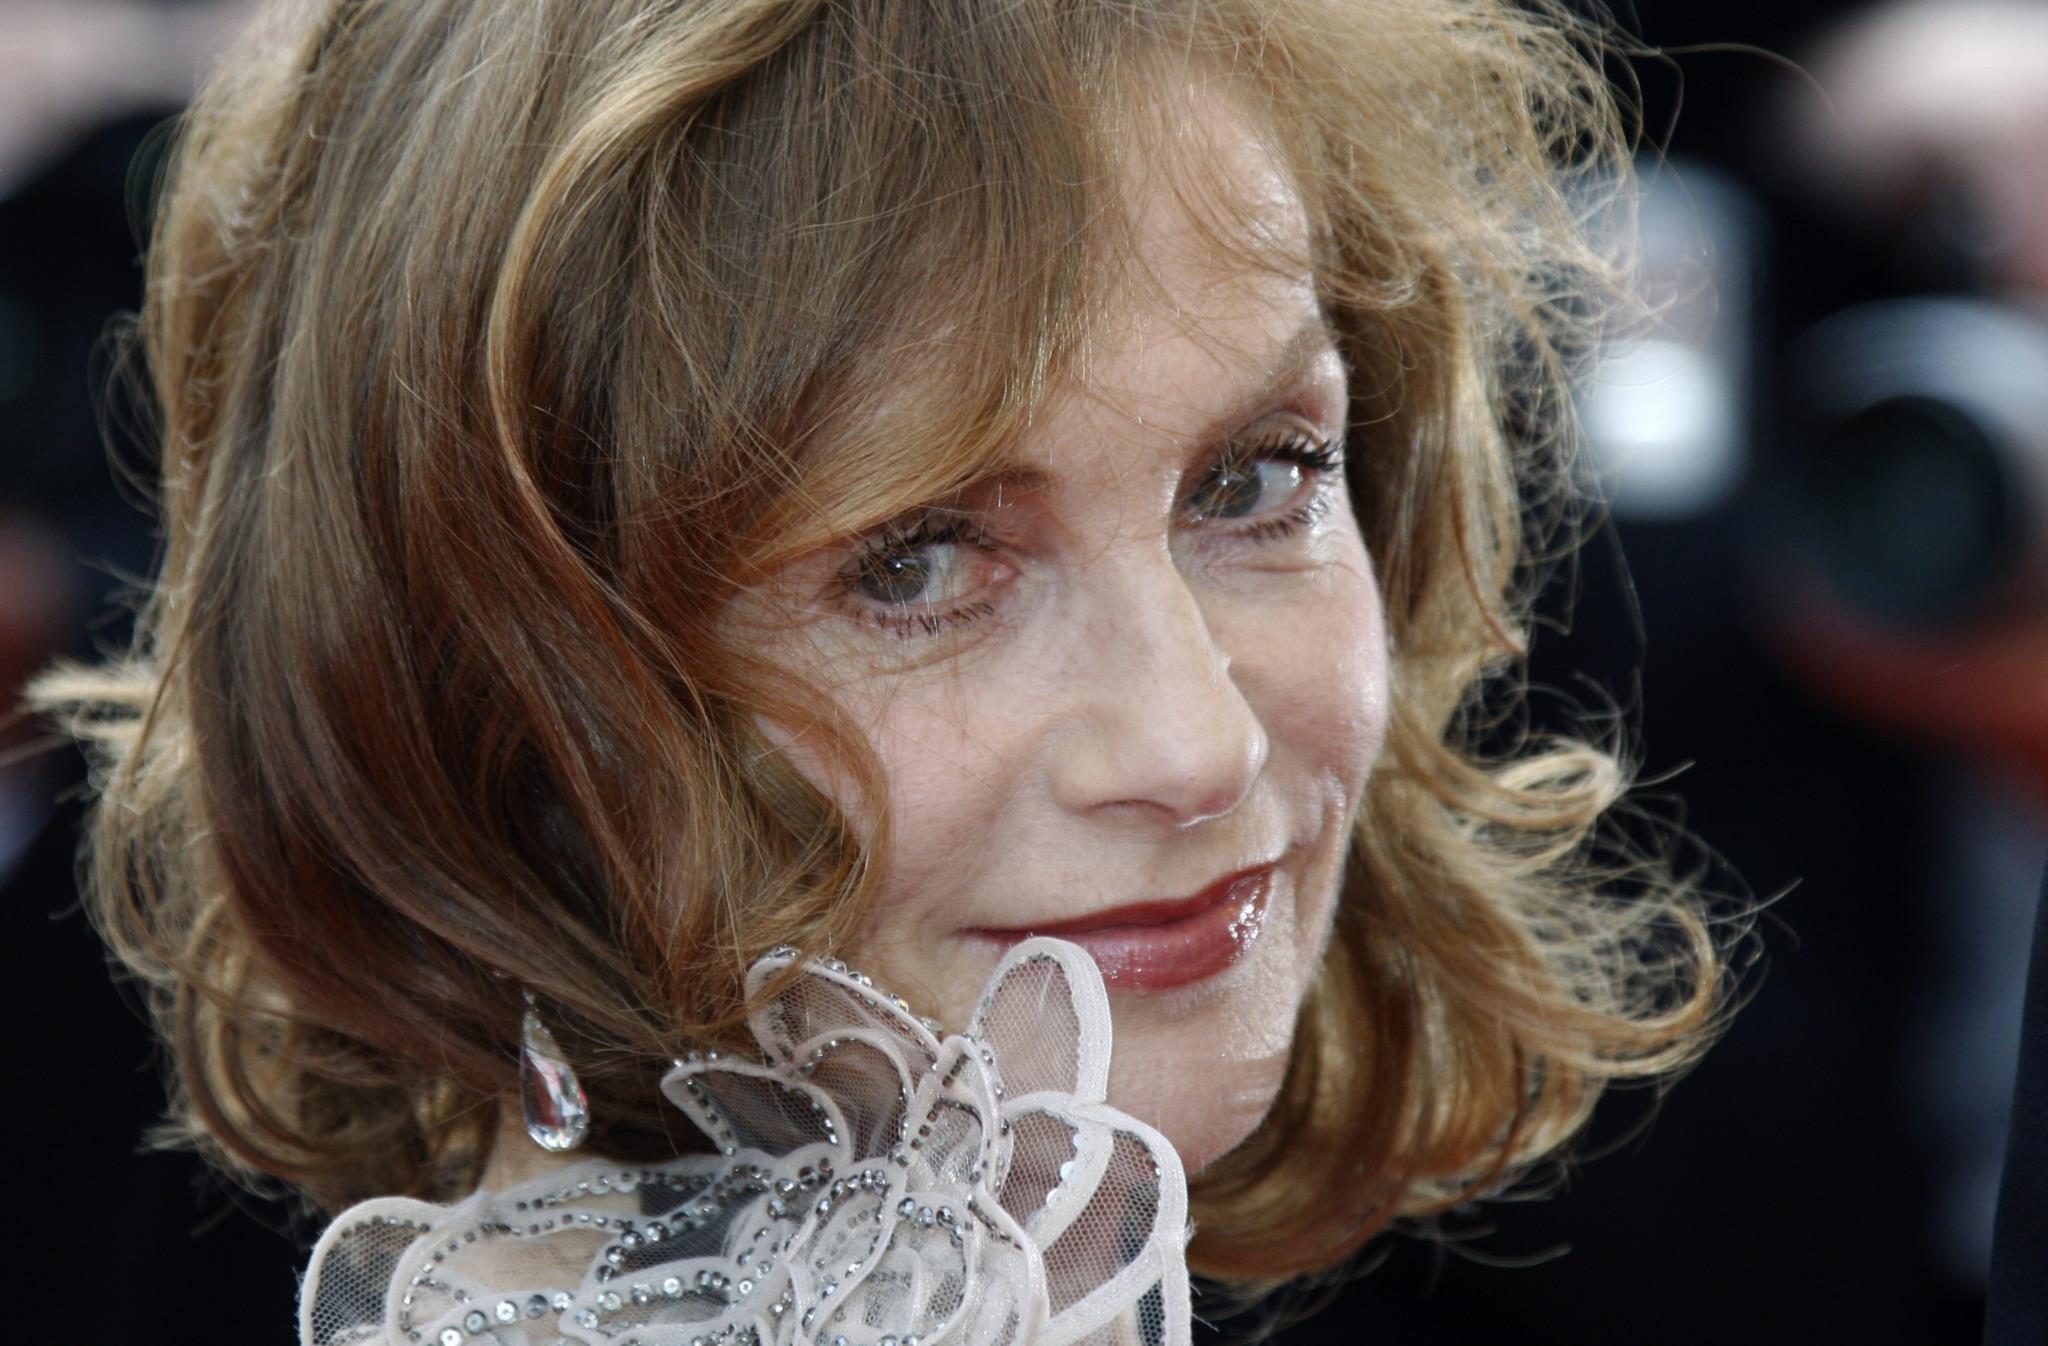 PÚBLICO - LEFFEST muda-se para Sintra com Isabelle Huppert a abrir a porta